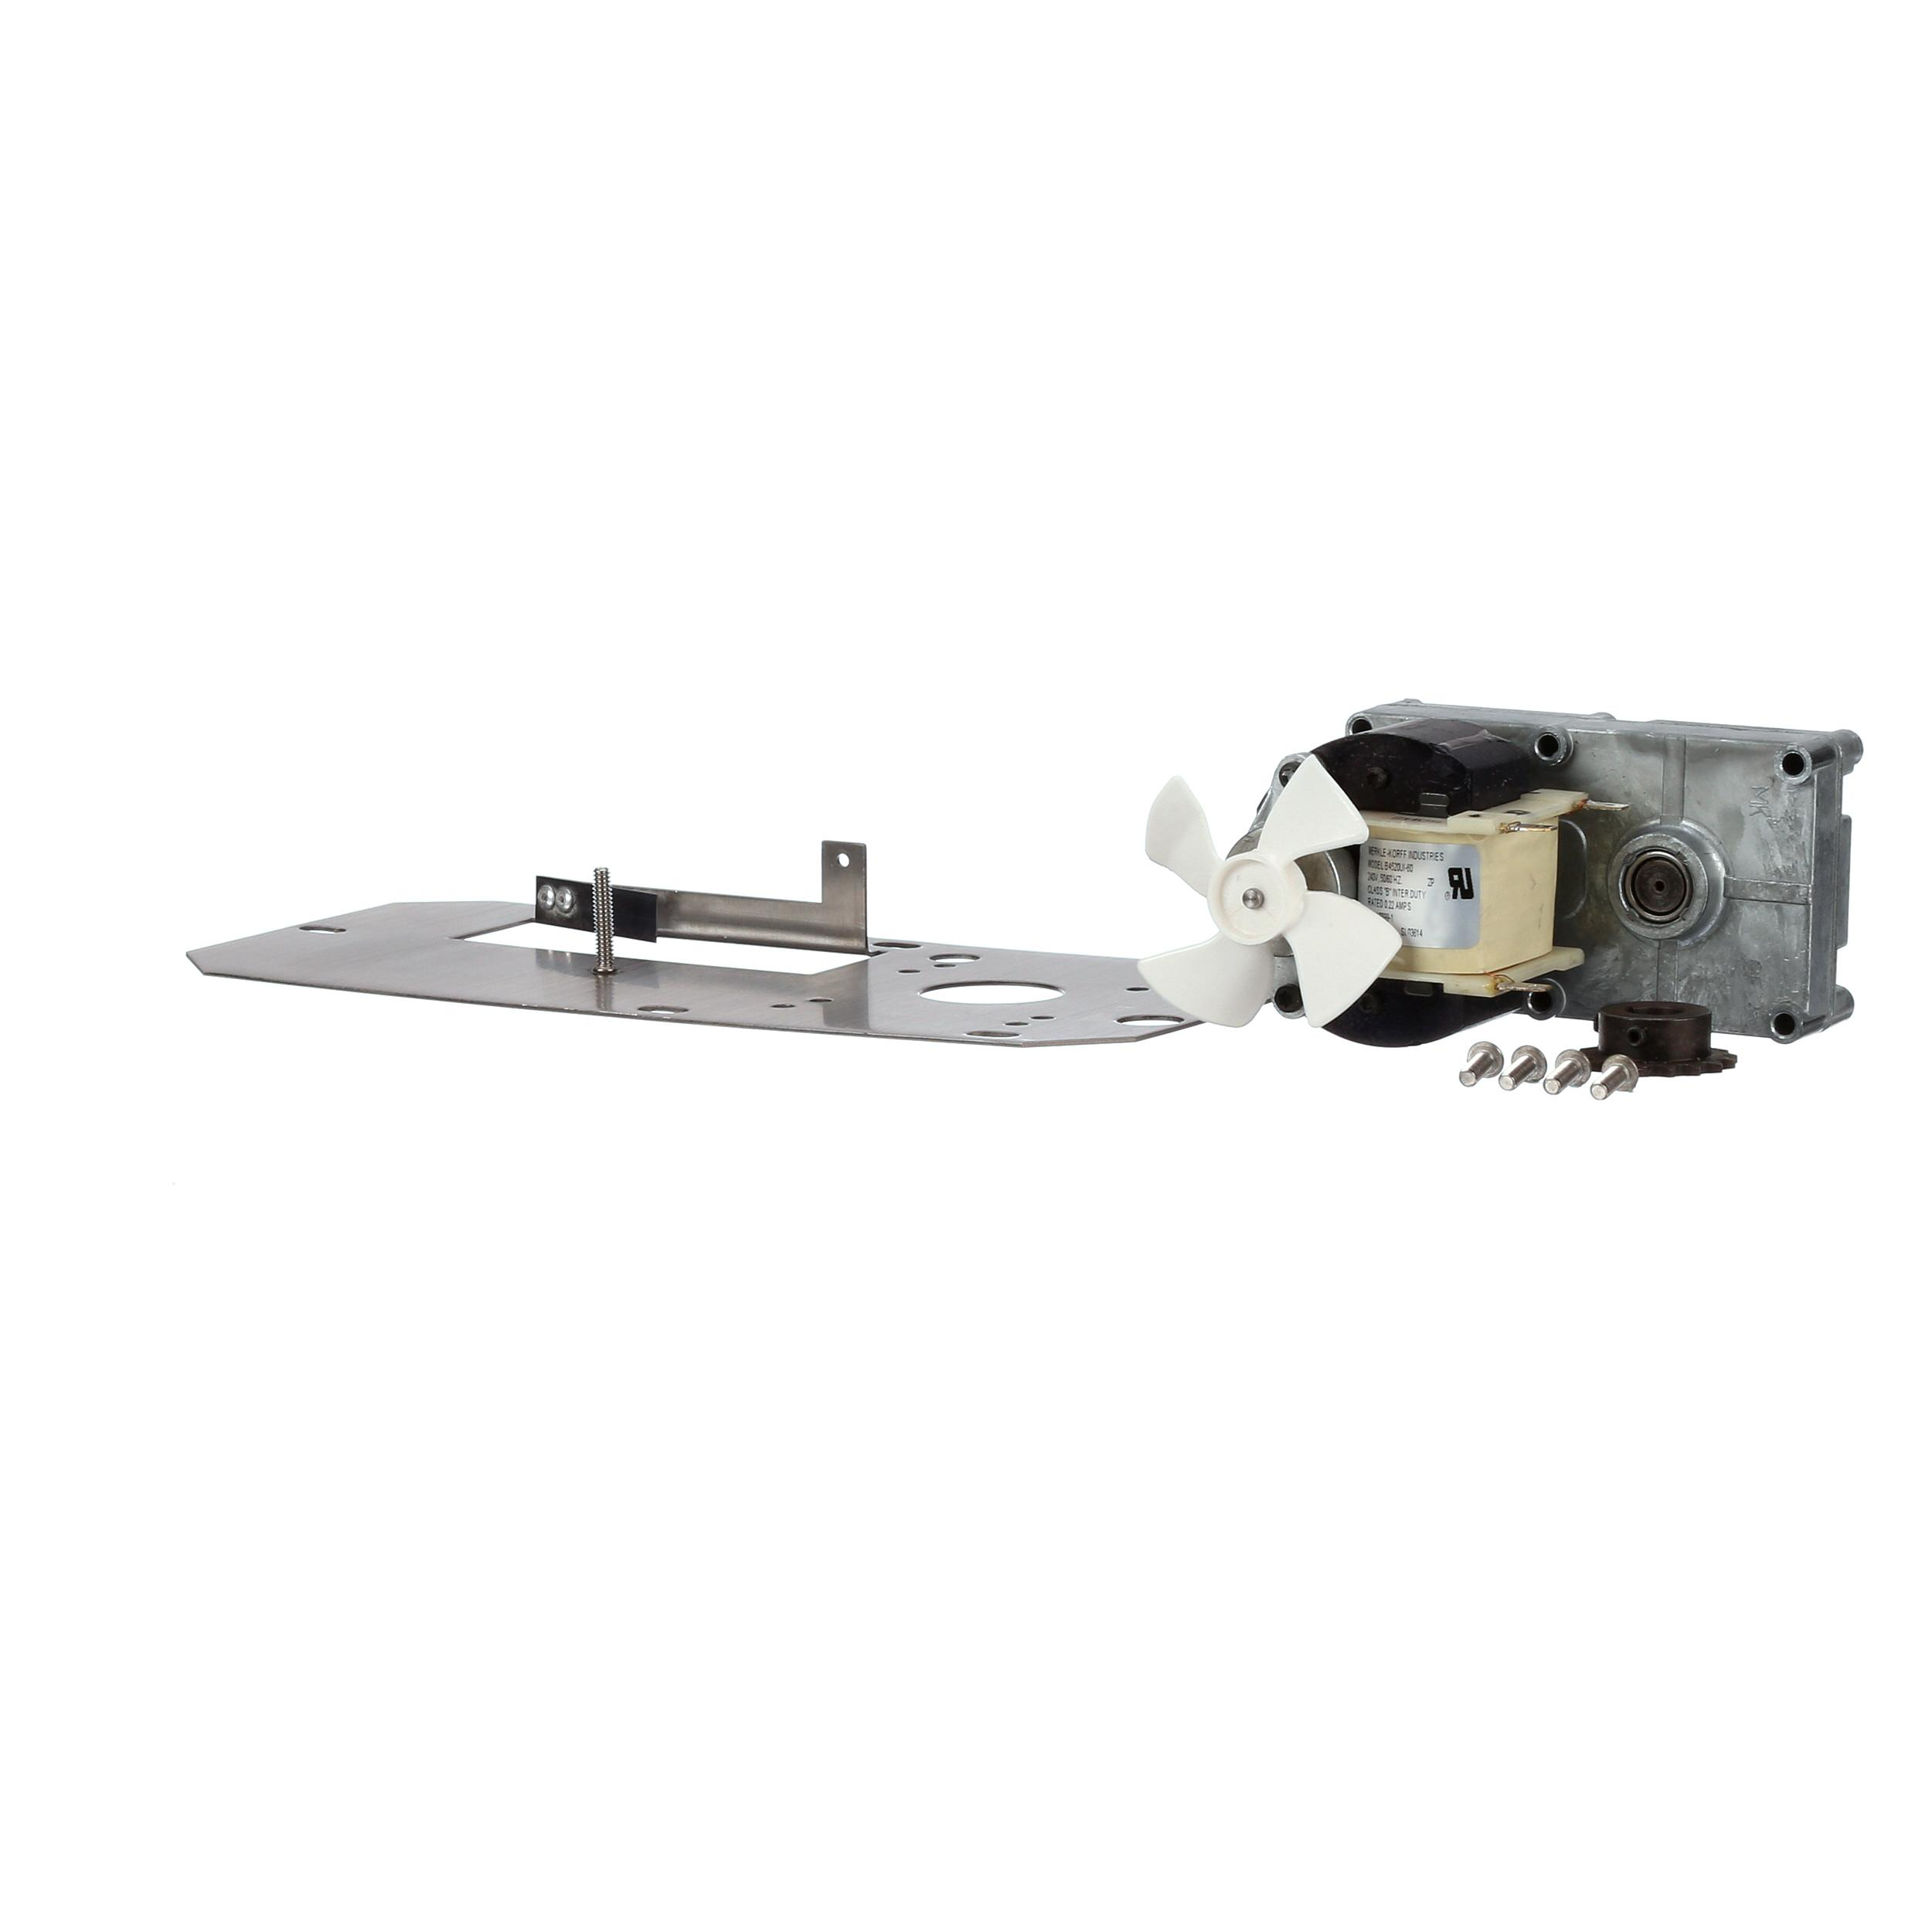 STAR MOTOR KIT W/ GEARBOX